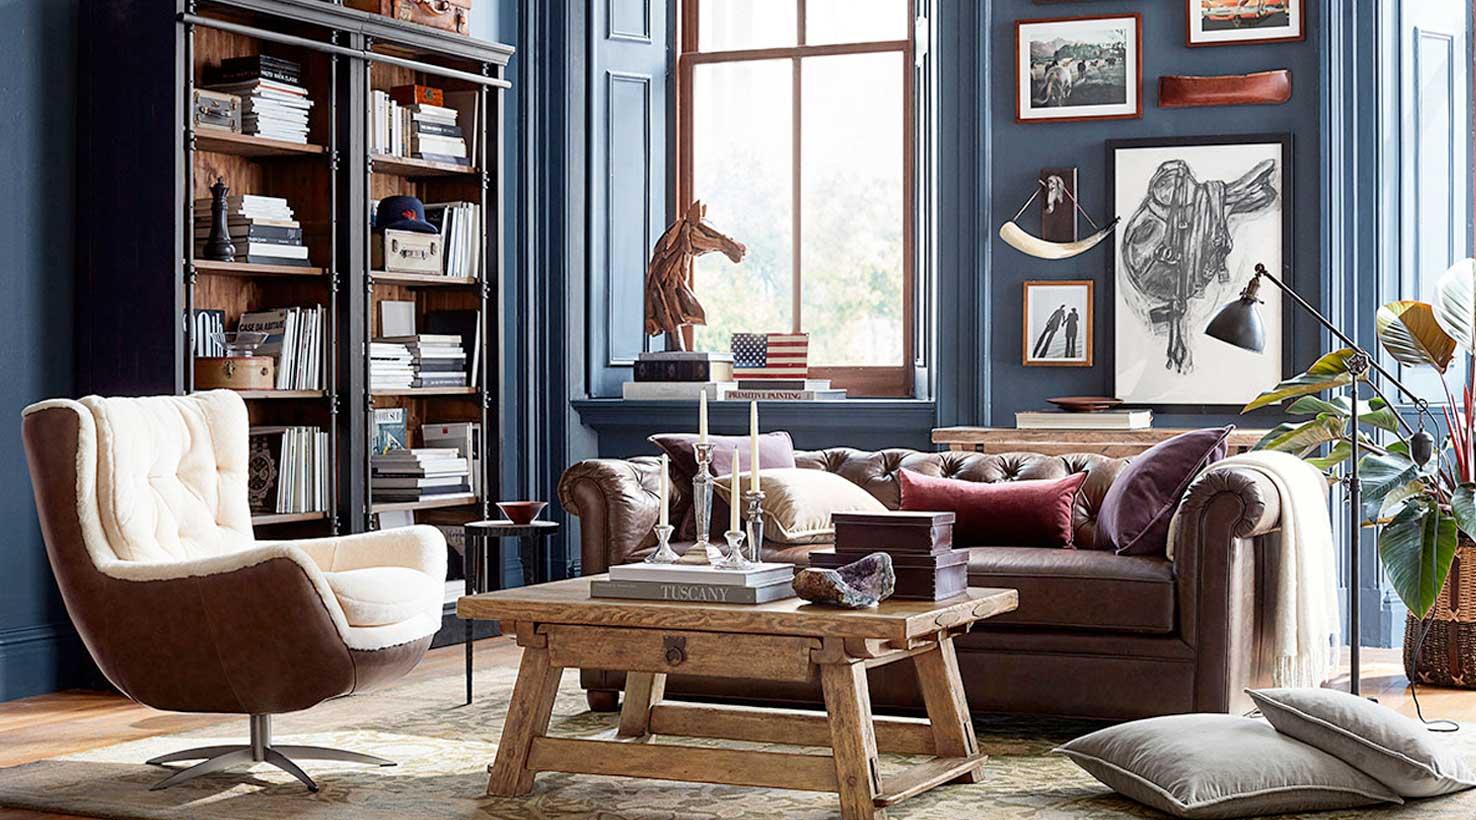 Painting ideas for living room ... living room - blues ... UQNCSJG